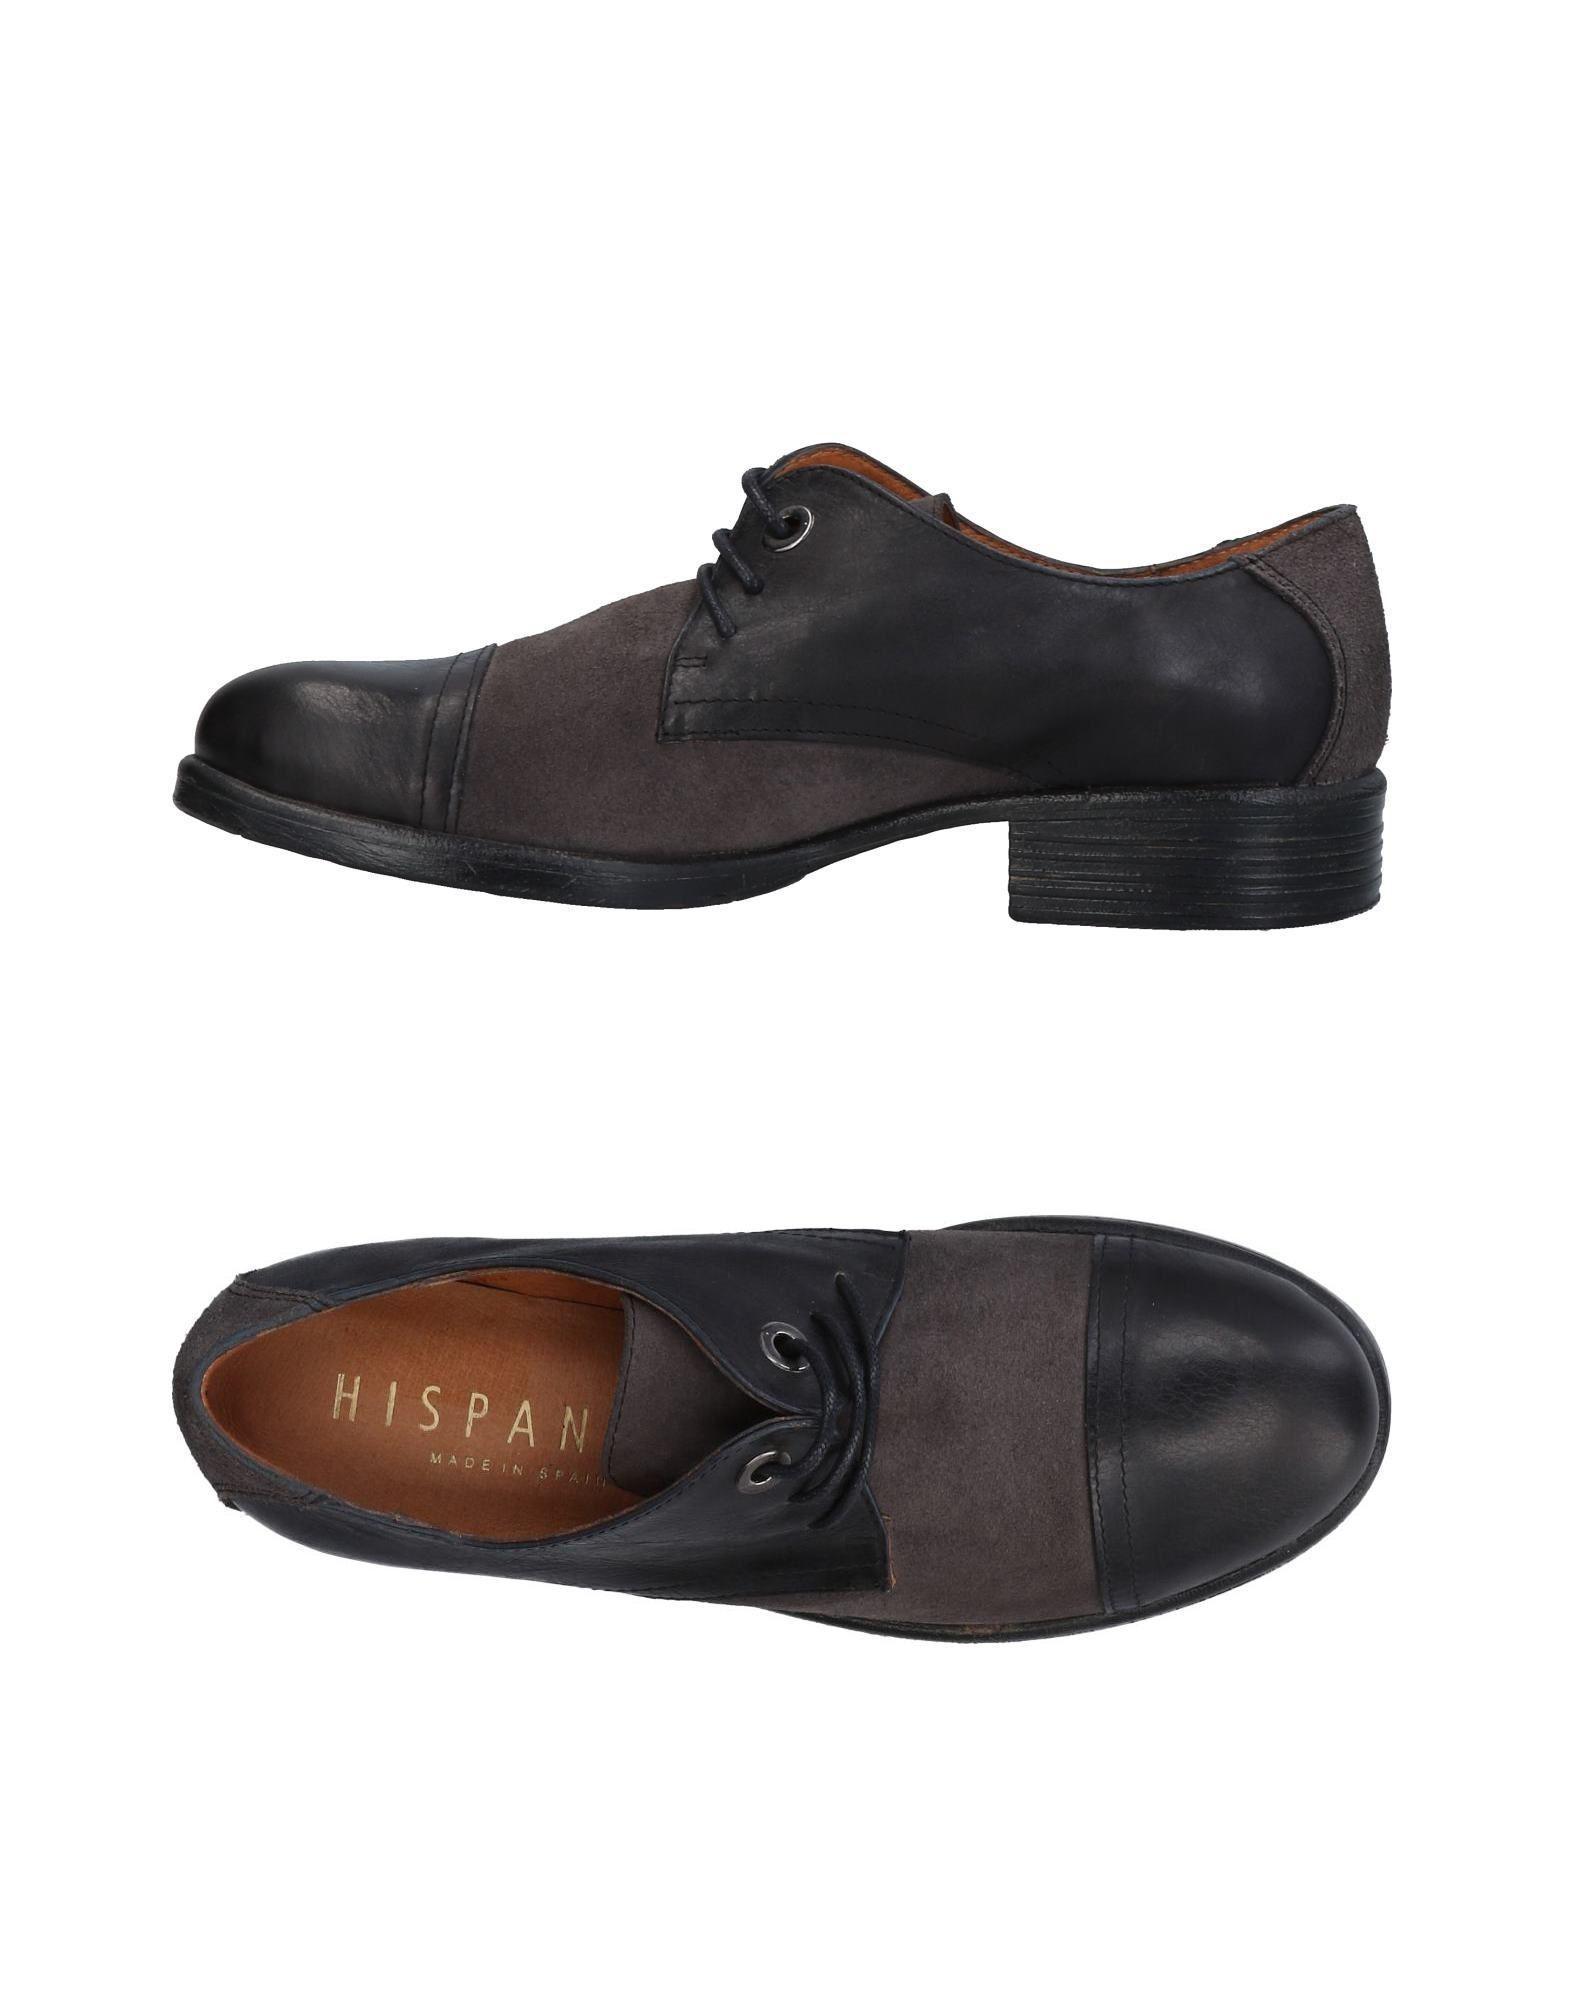 Hispanitas Chaussures À Lacets Jgqcat2Qm